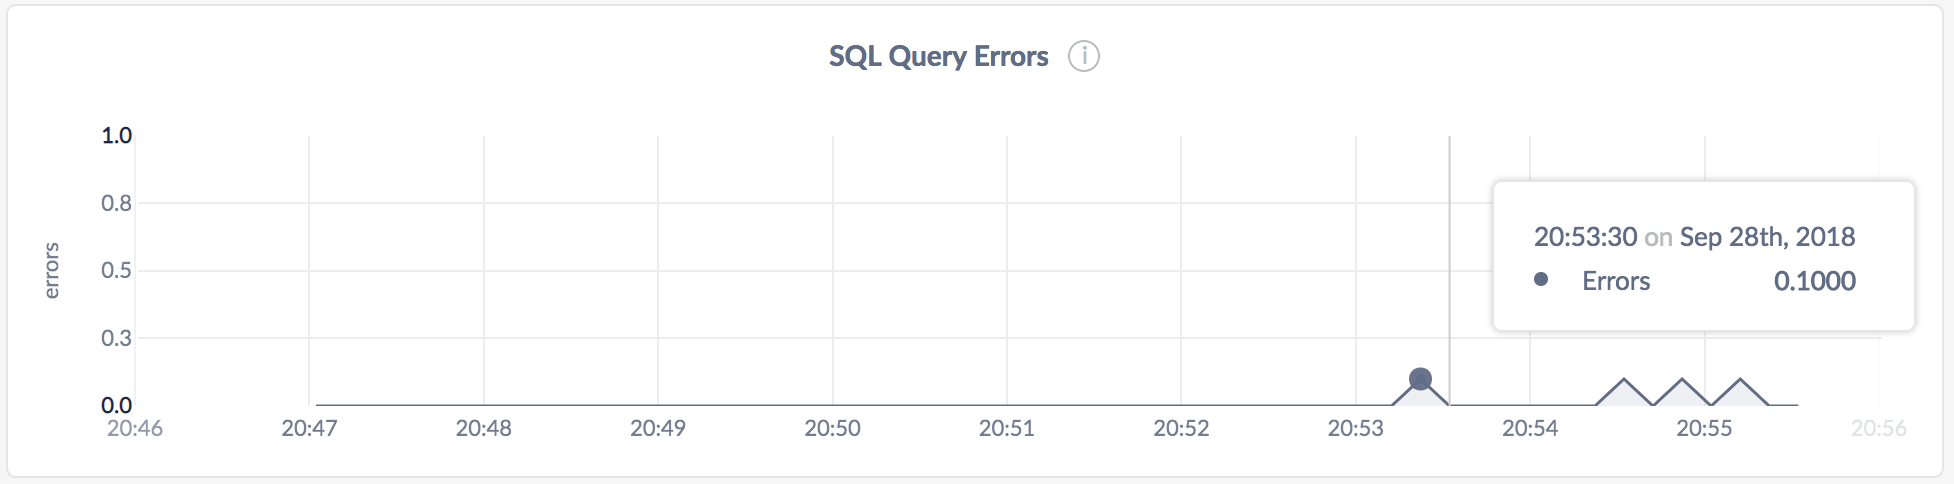 CockroachDB Admin UI SQL Query Errors